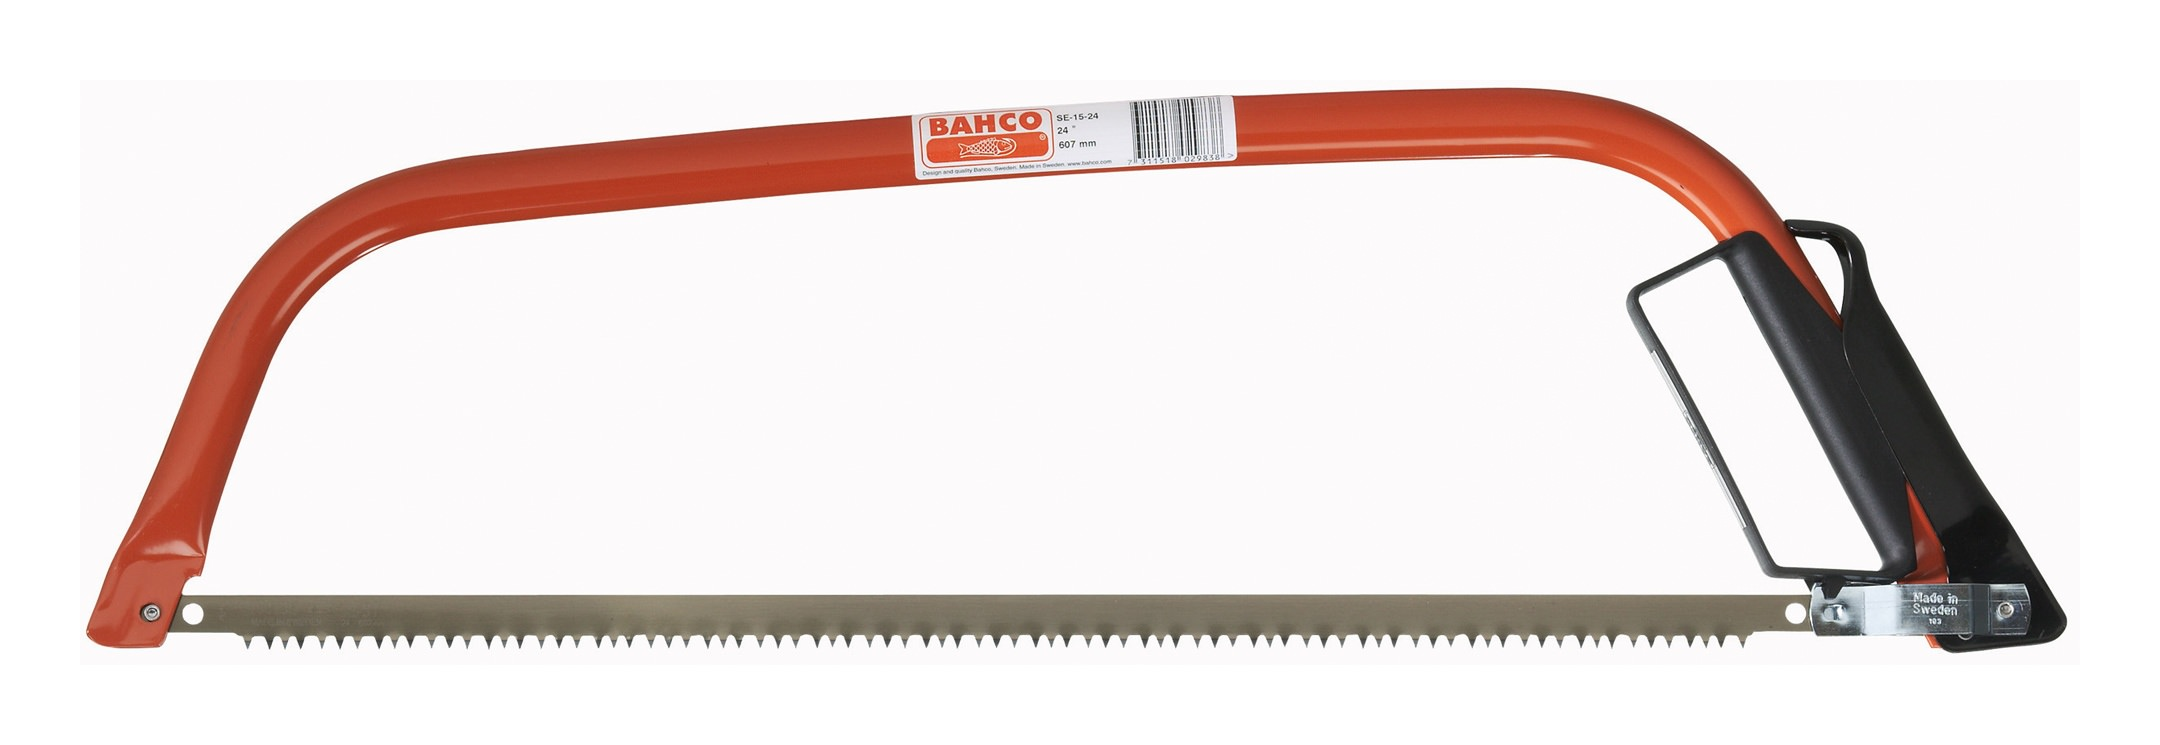 Bahco Bügelsäge 525mm - SE-16-21